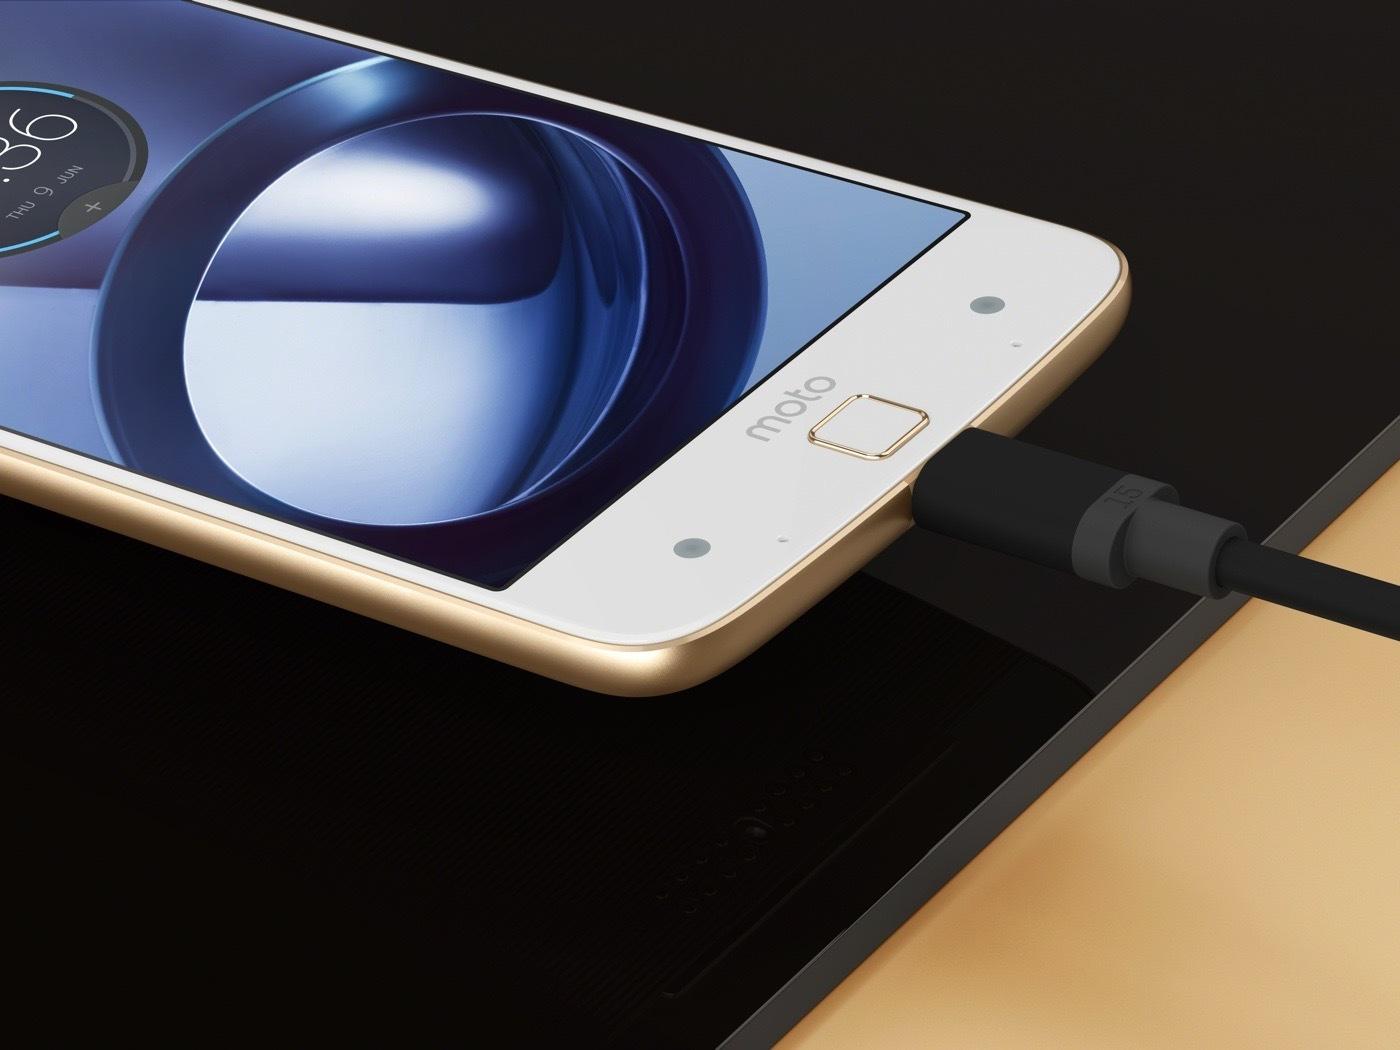 Motorola Moto Z & Z Force announced: specs, design, price & release